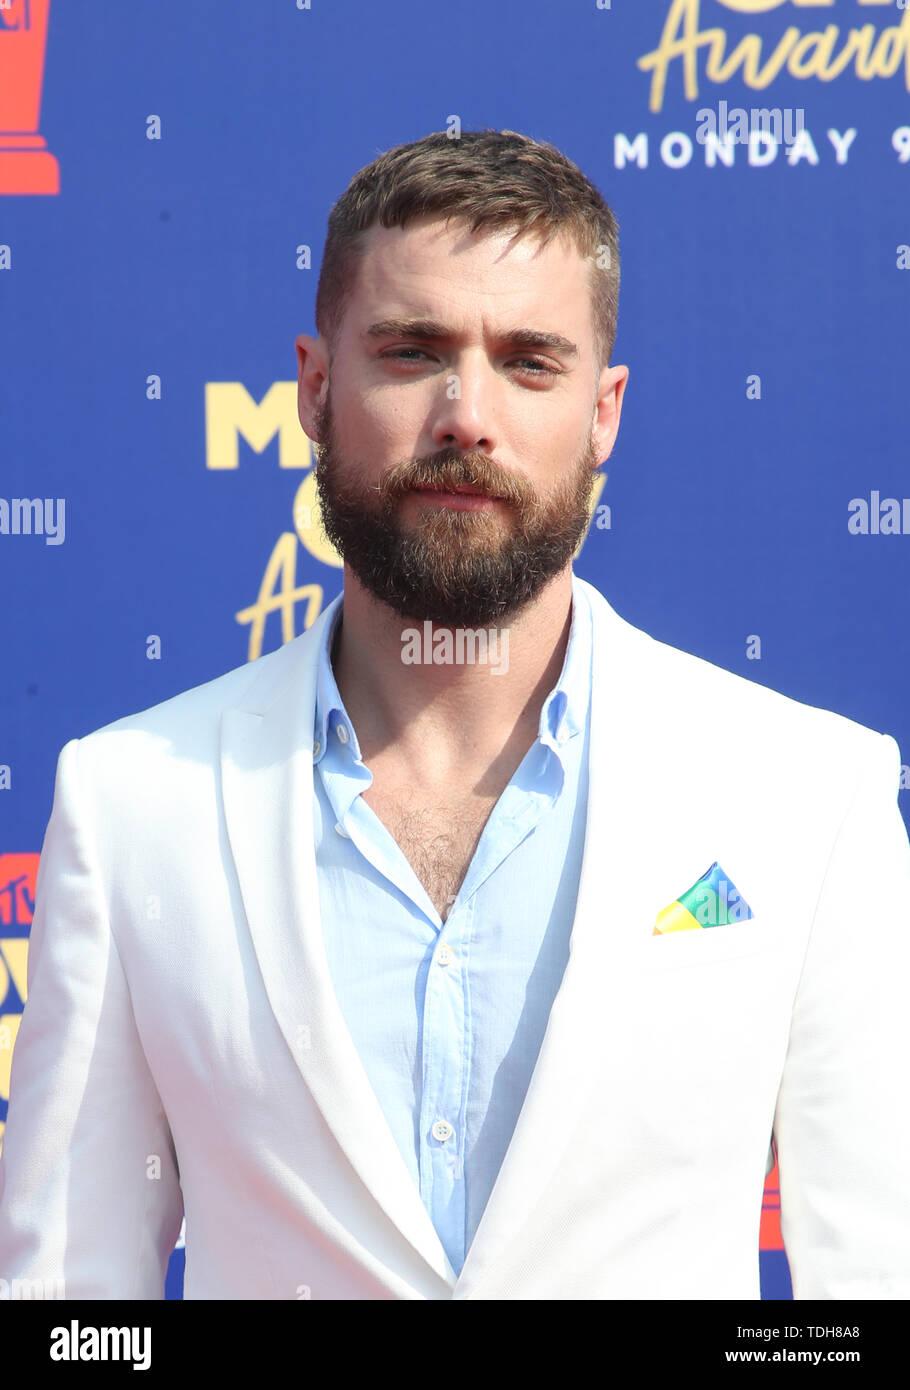 SANTA MONICA, CA - JUNE15: Dustin Milligan, at the 2019 MTV Movie & TV Awards sponsored by M&M's, MTN DEW, Taco Bell®, and truth at Barker Hangar in Santa Monica, California on June 15, 2019. Credit: Faye Sadou/MediaPunch Stock Photo